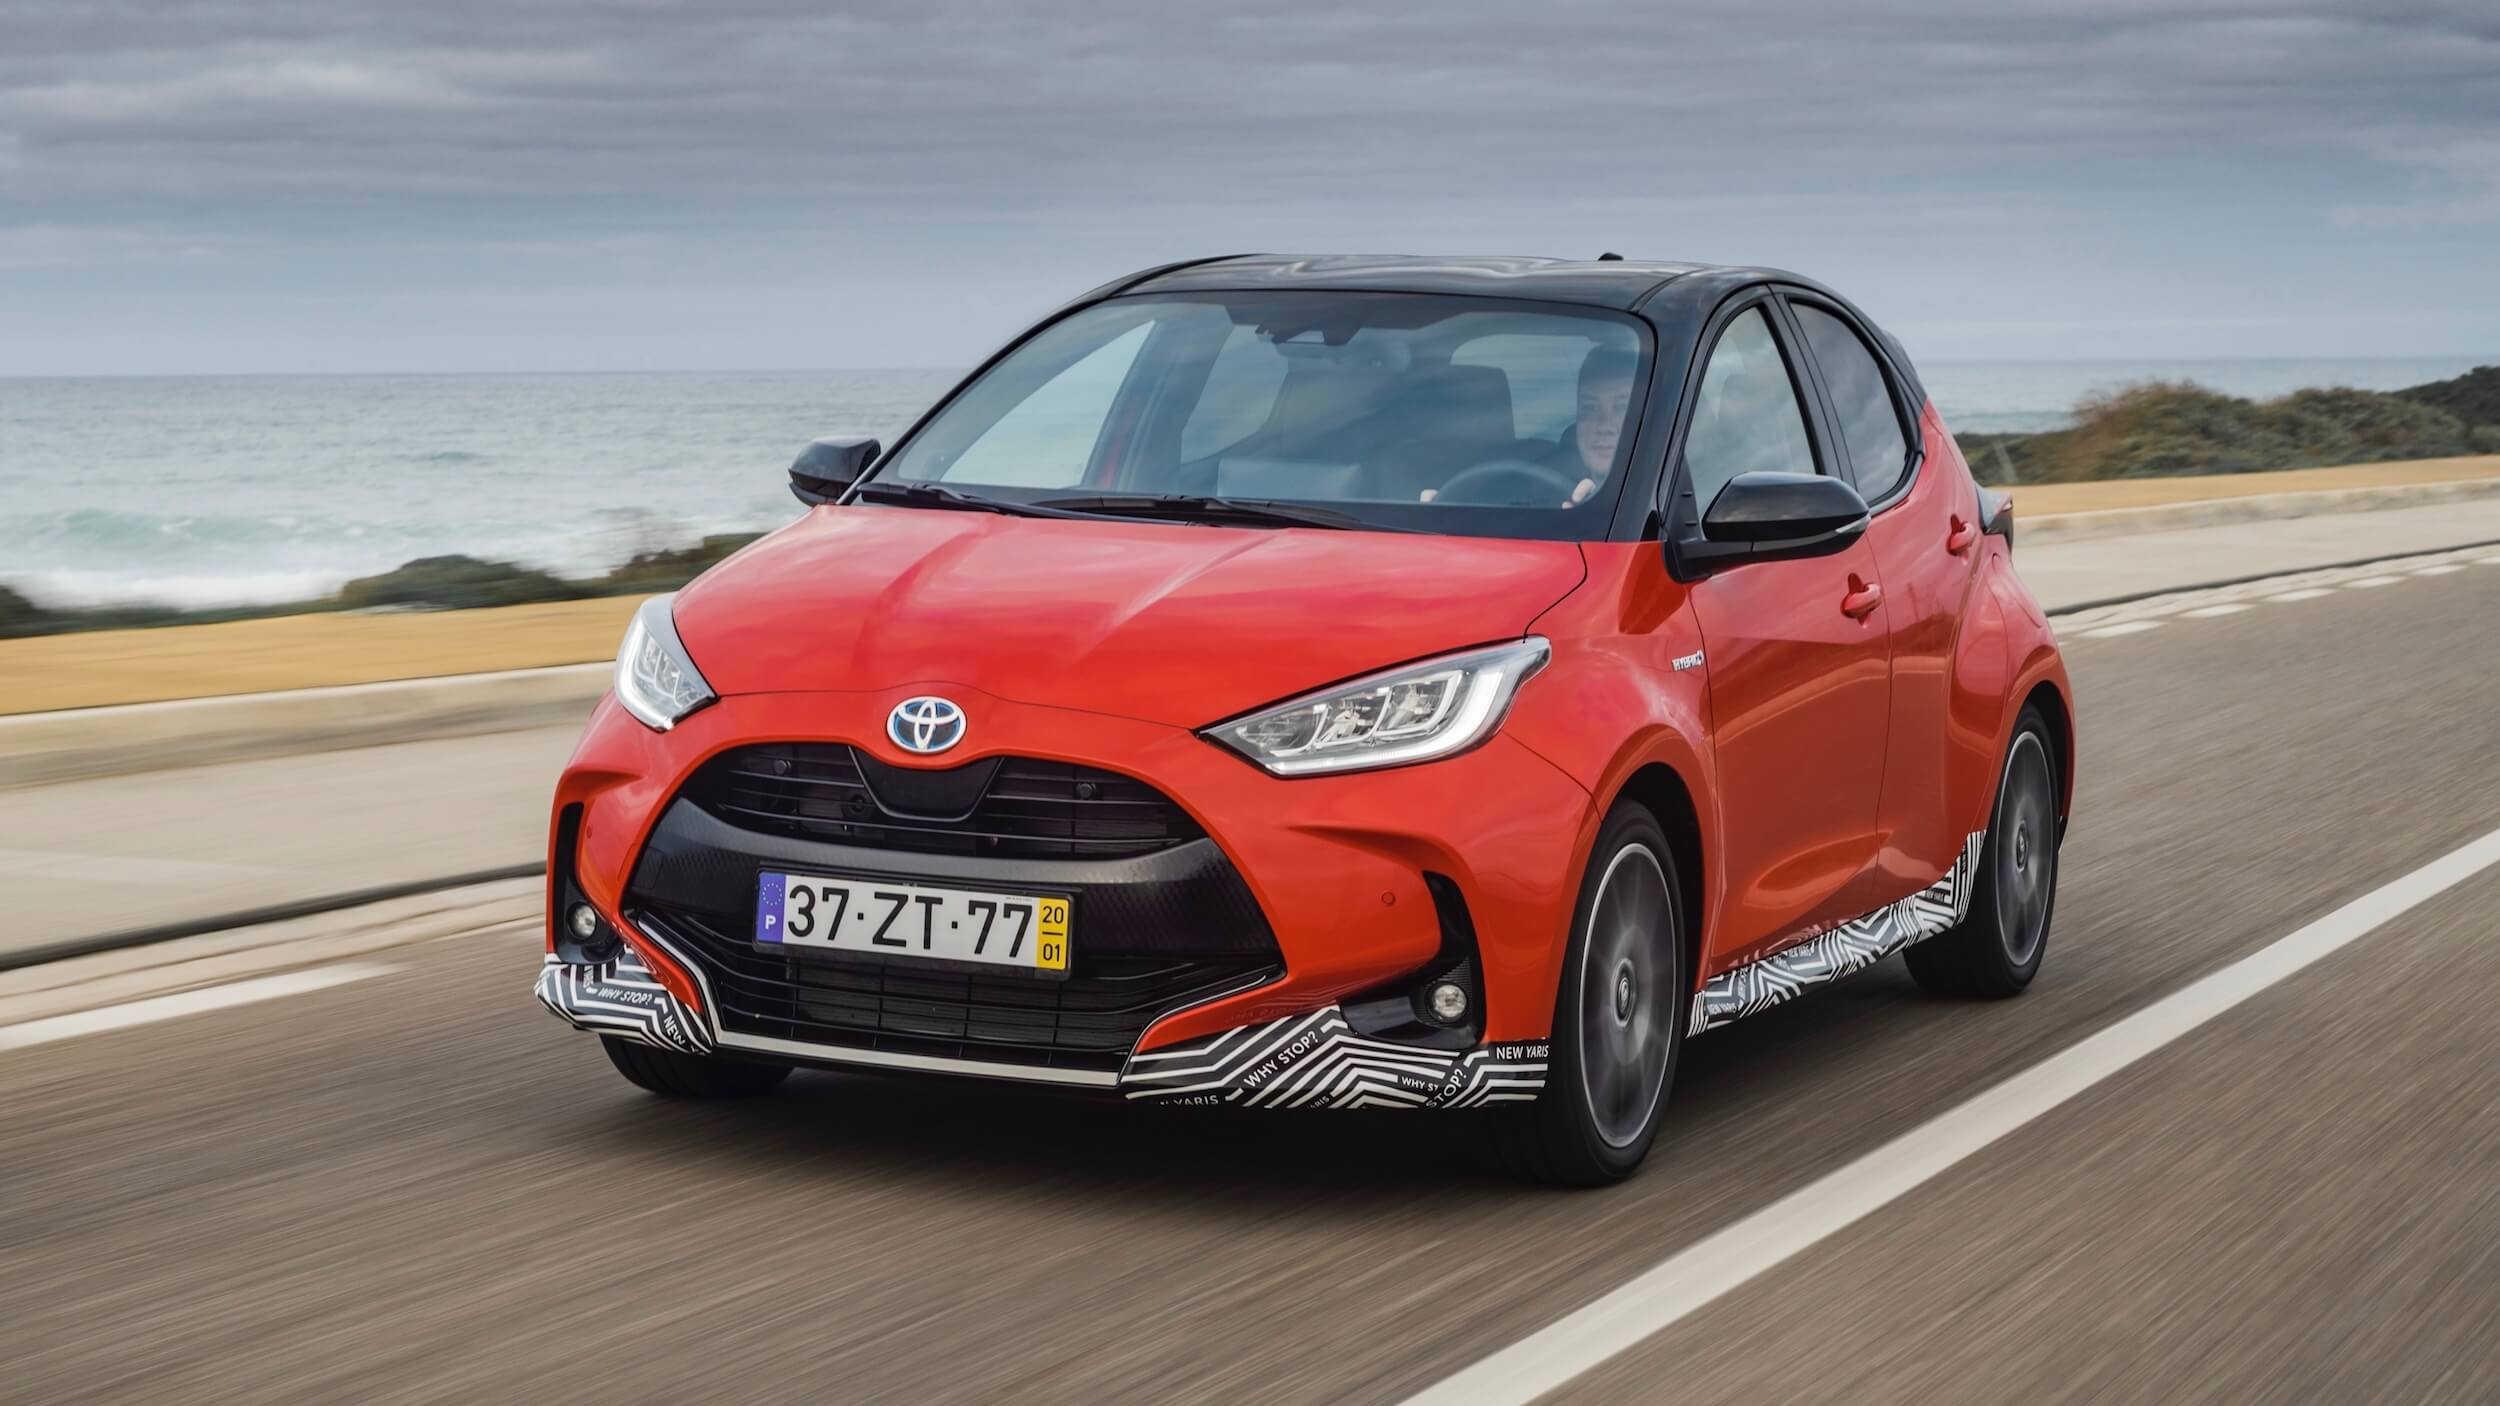 2021 Toyota Yaris hybrid